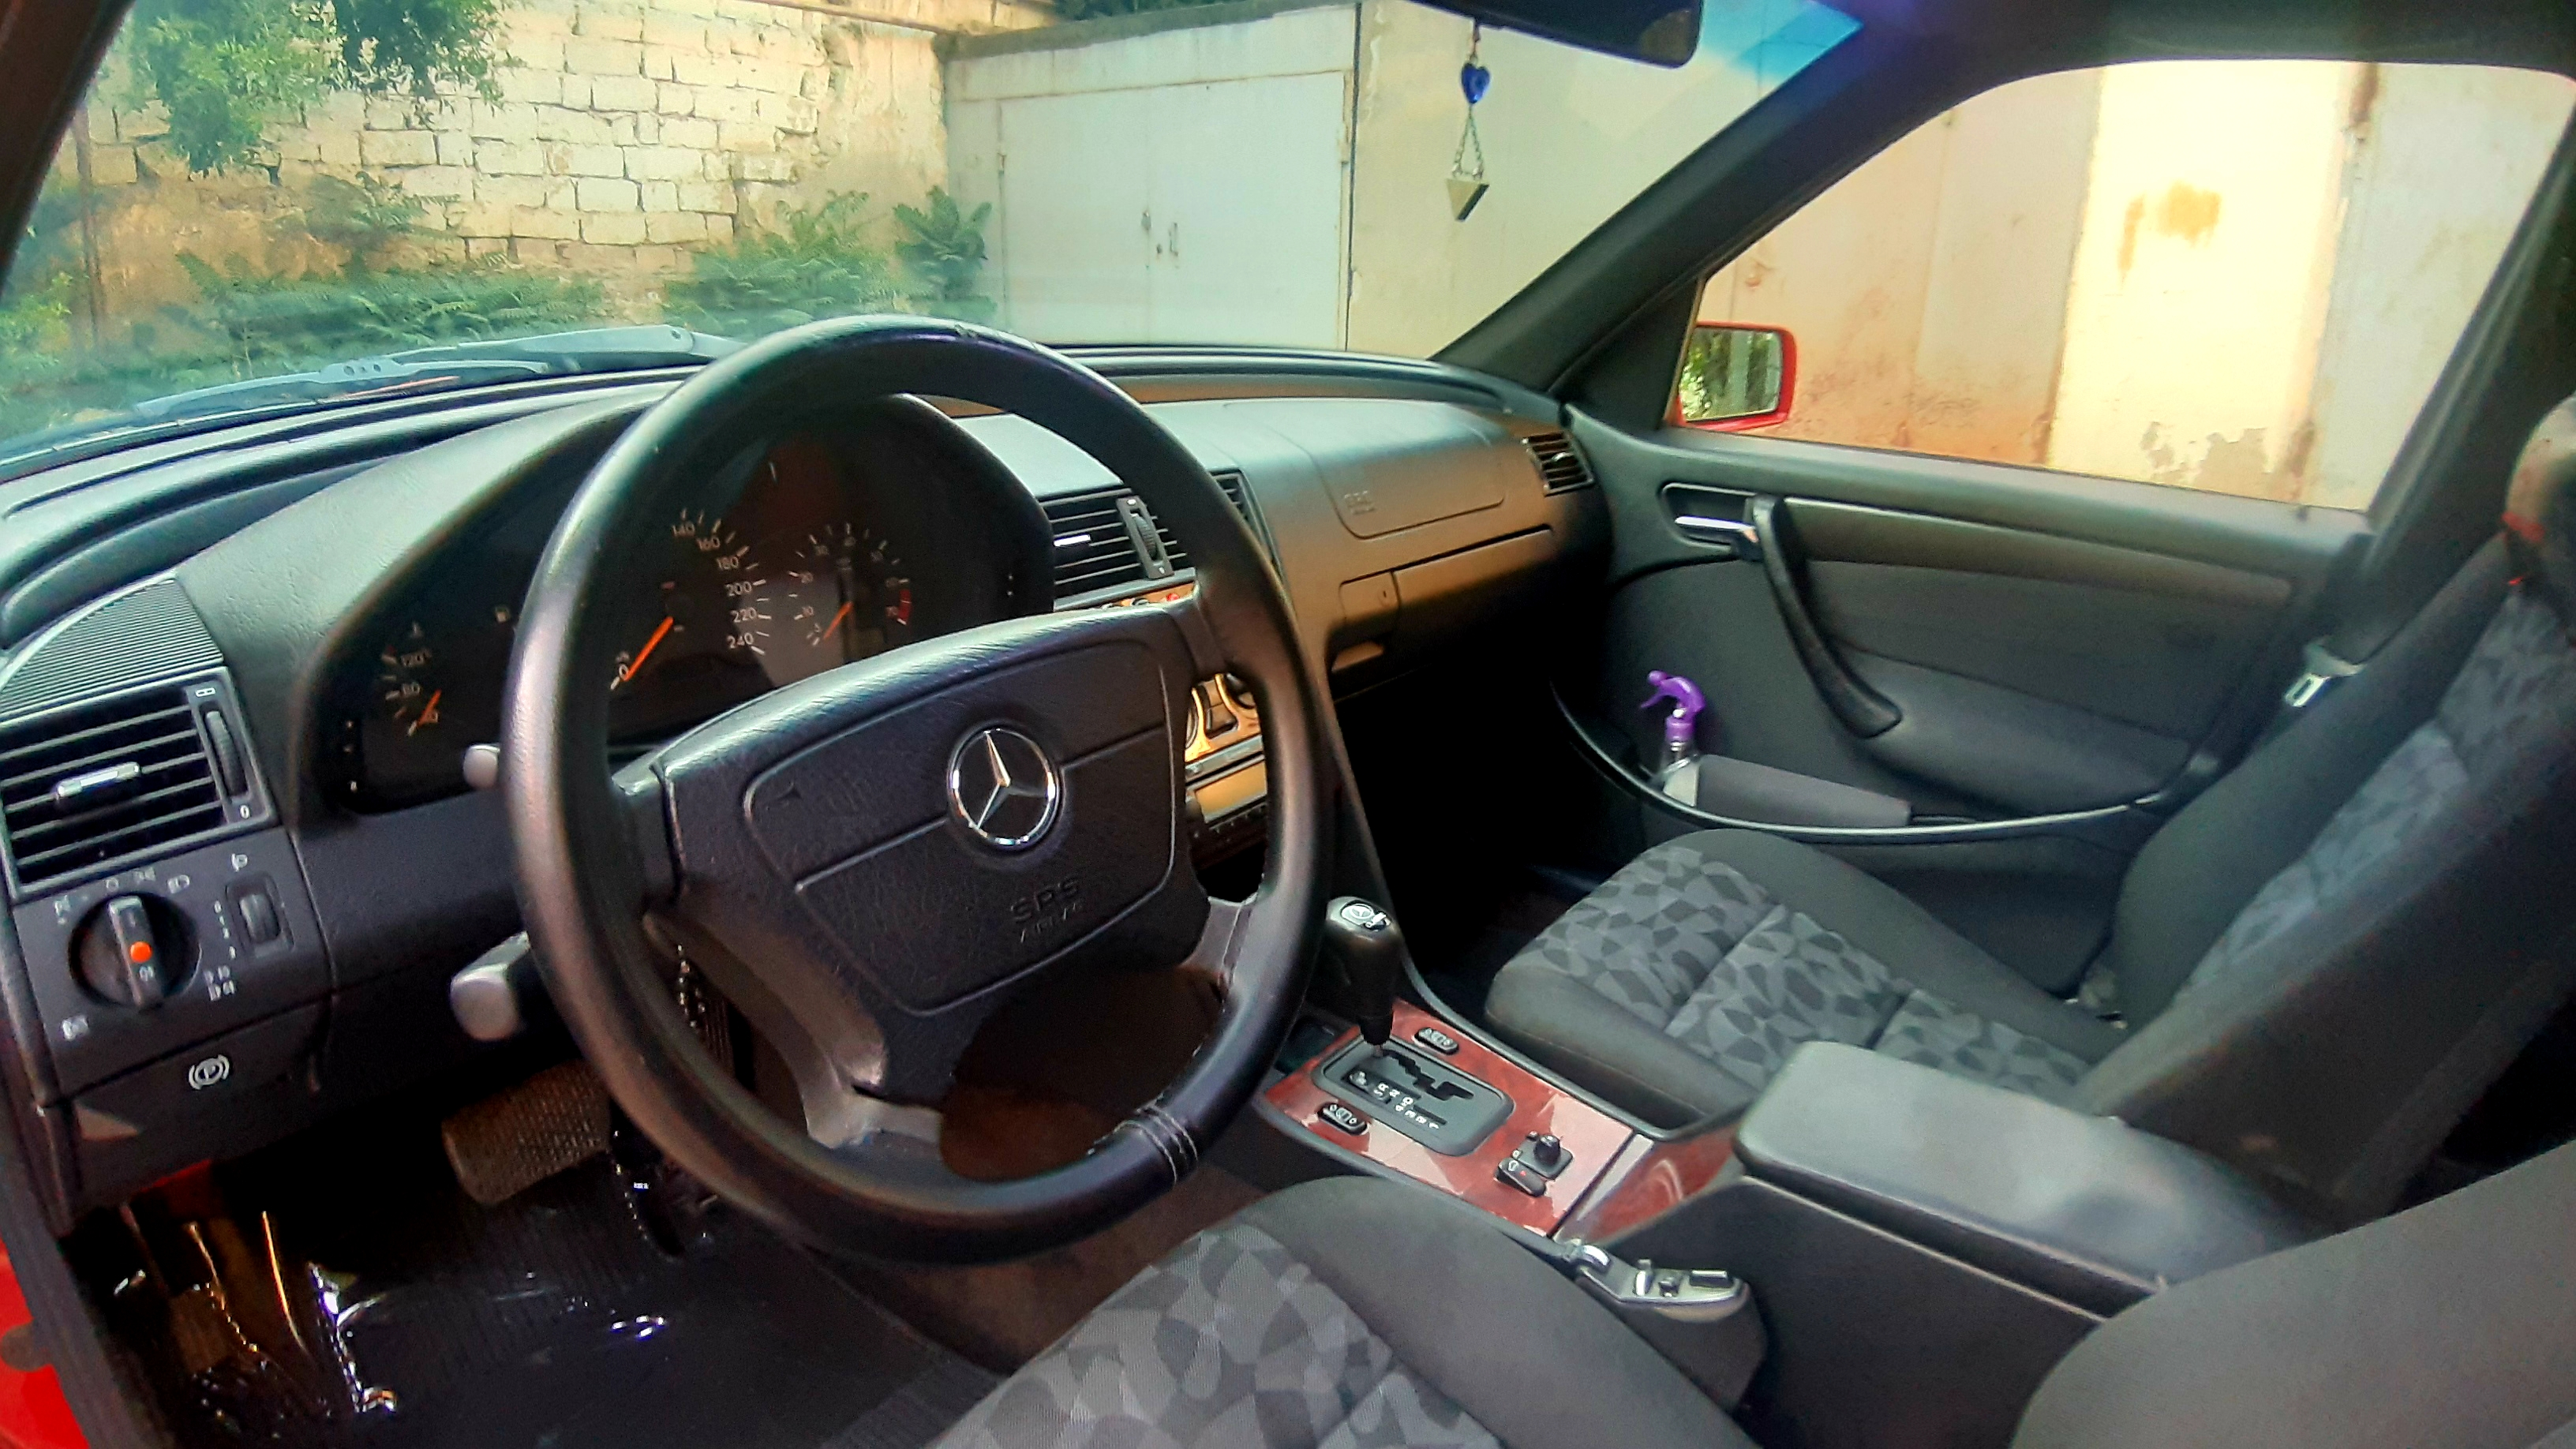 Mercedes-Benz C 180 1.8(lt) 1997 İkinci əl  $10300